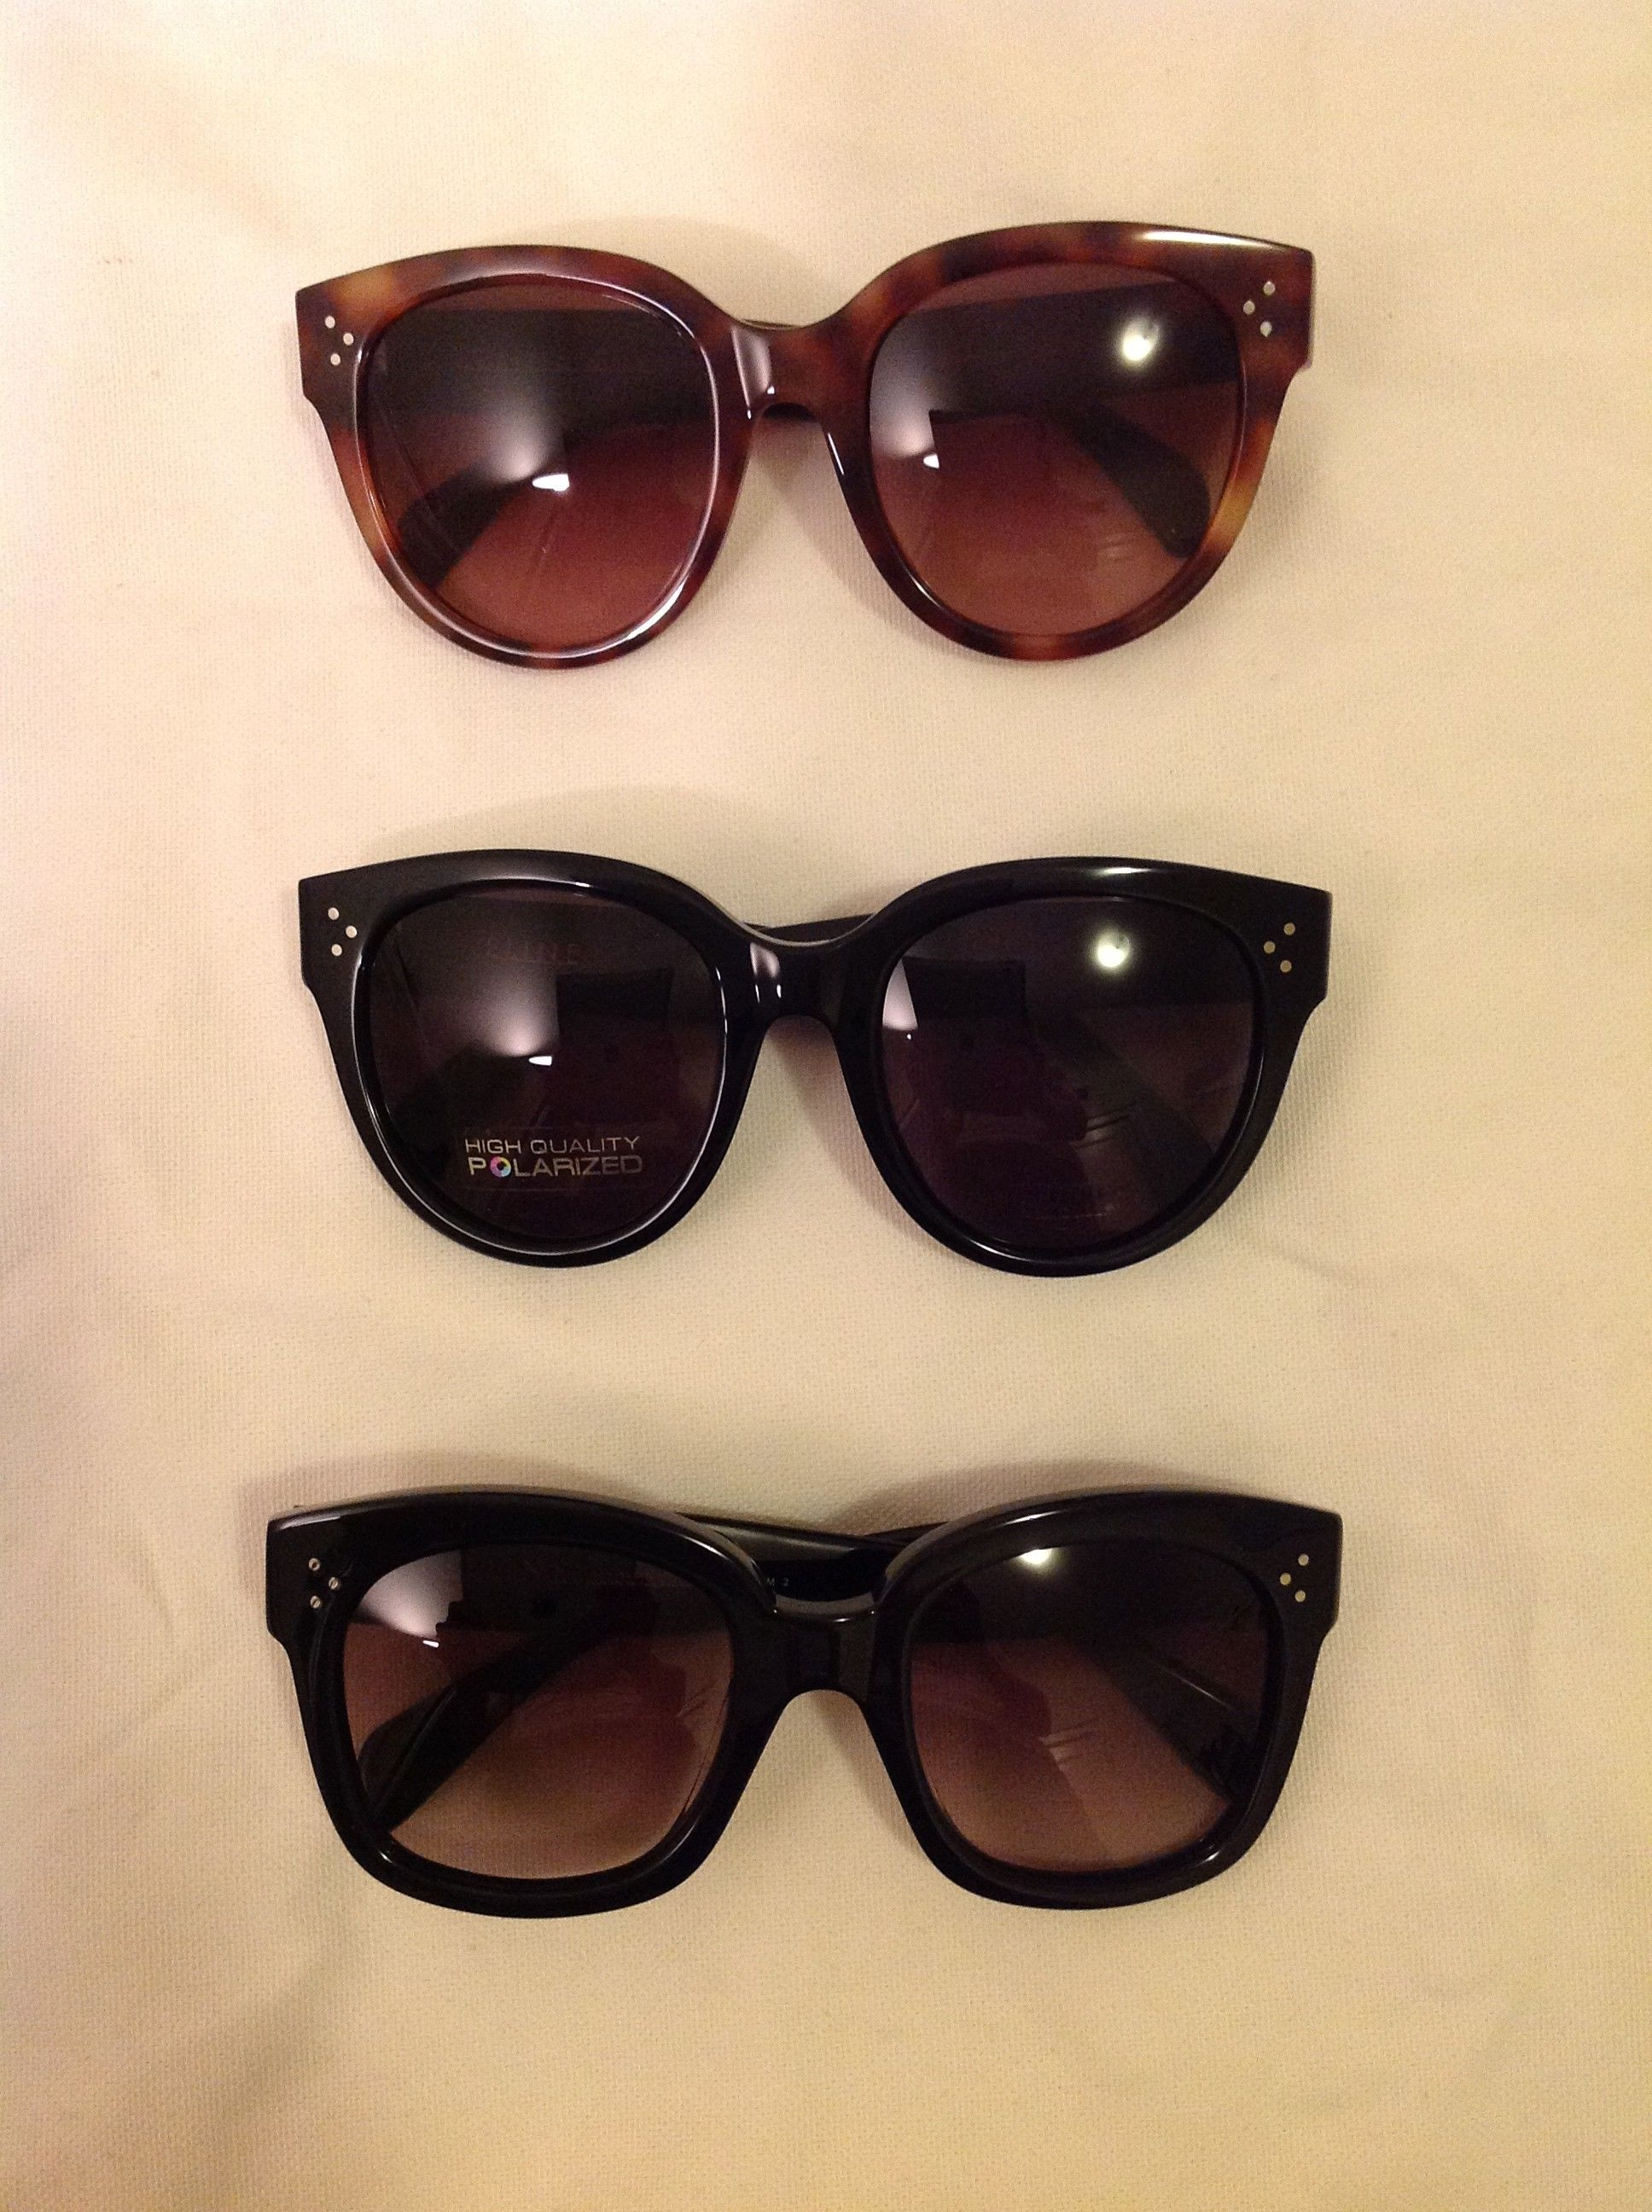 0d3df4ee5857 Celine Audrey Sunglasses